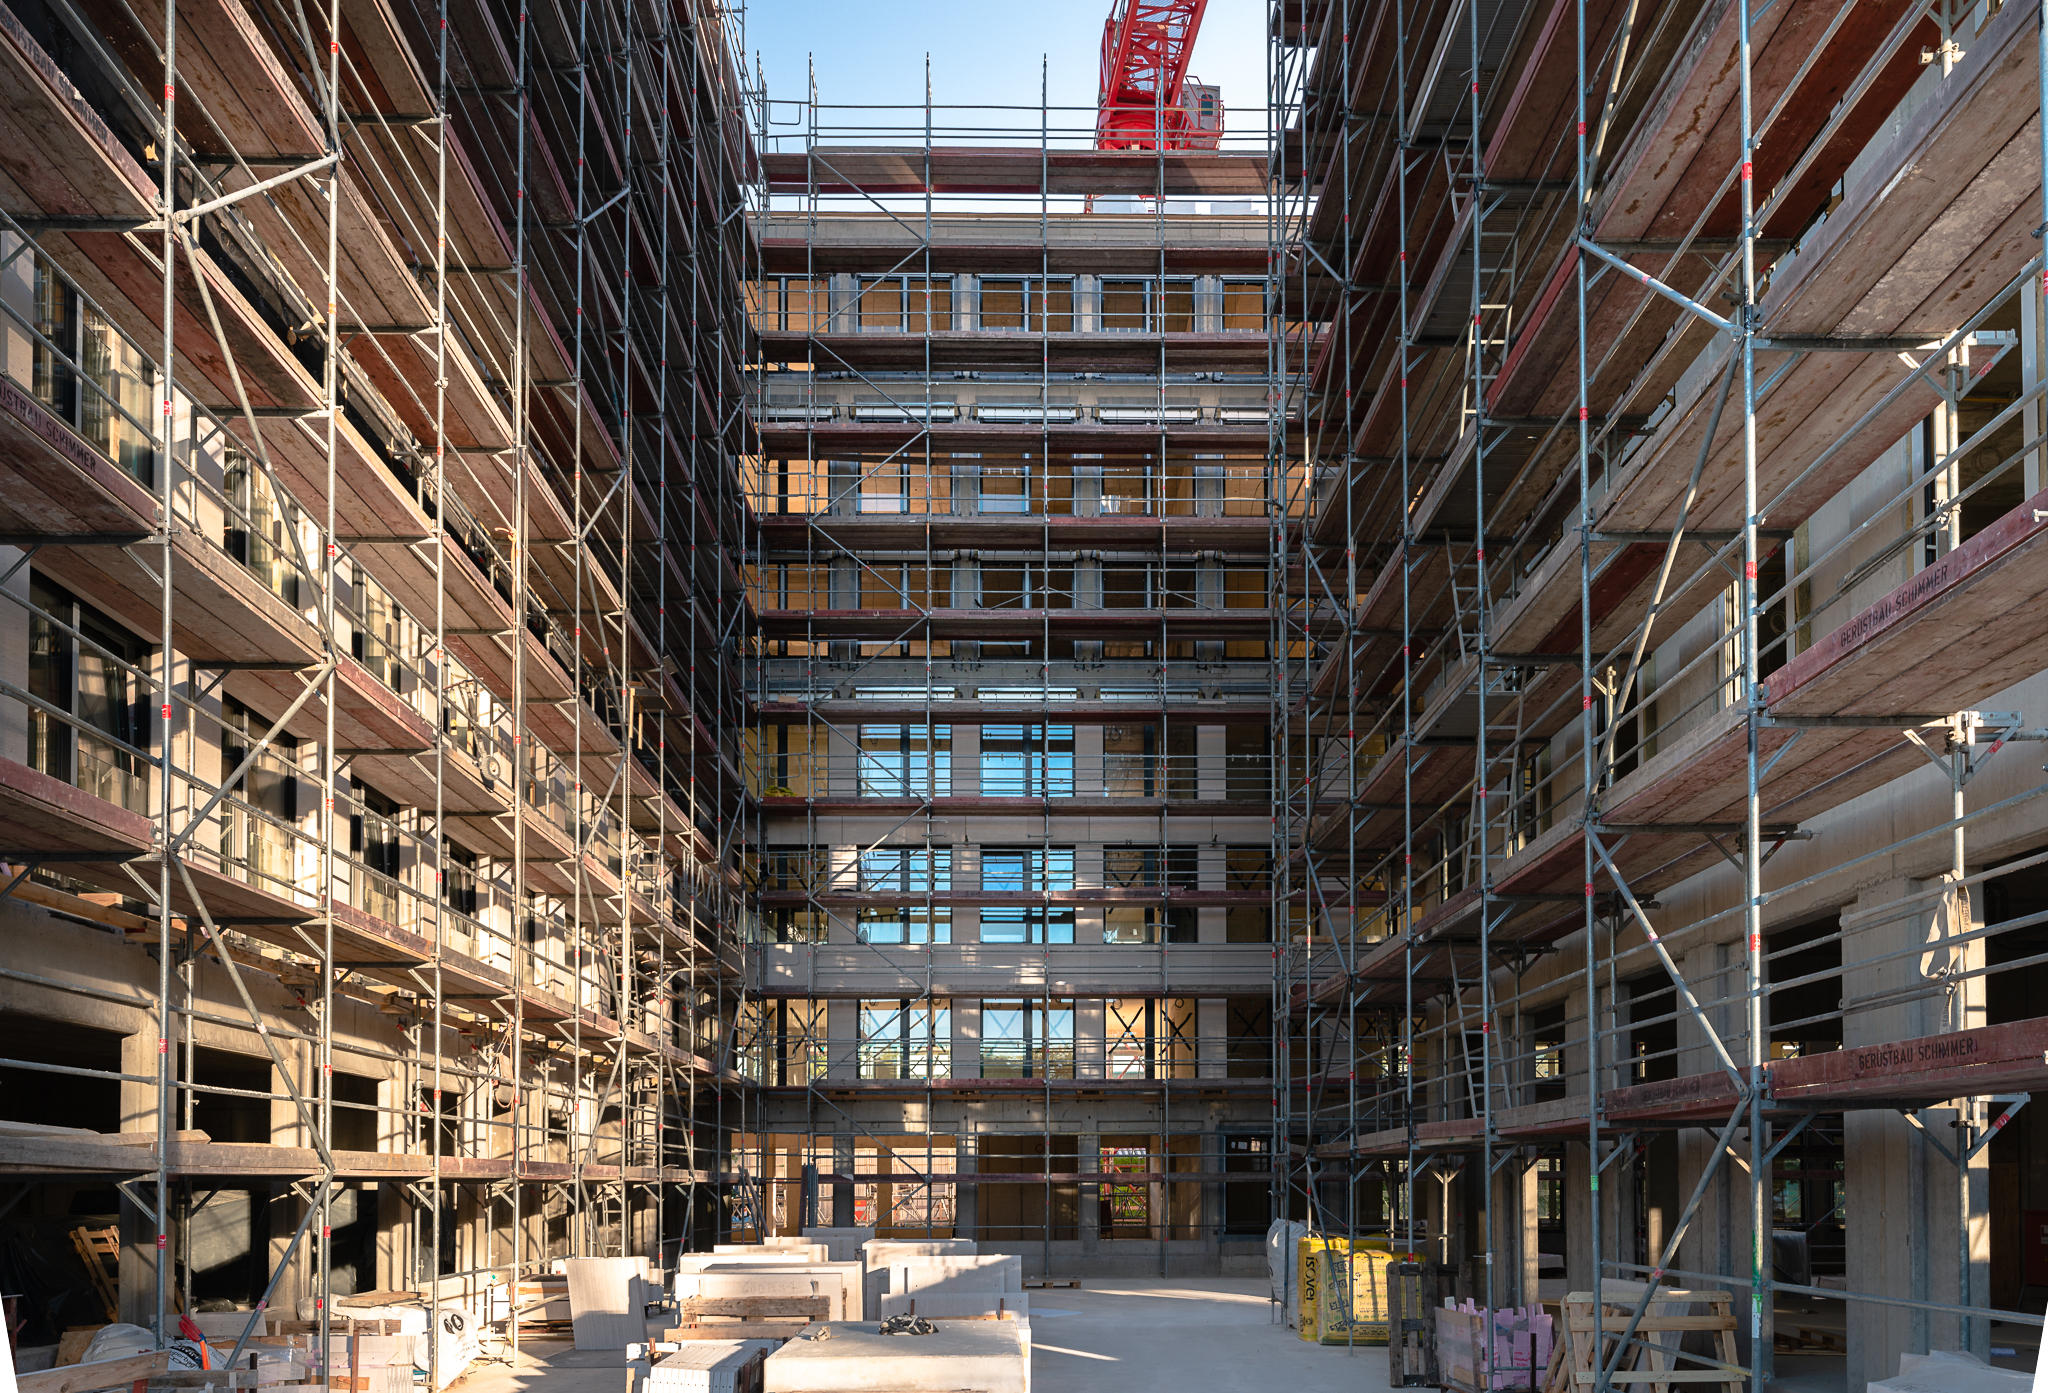 Baustellengerüst an der Fassade des Rohbaus